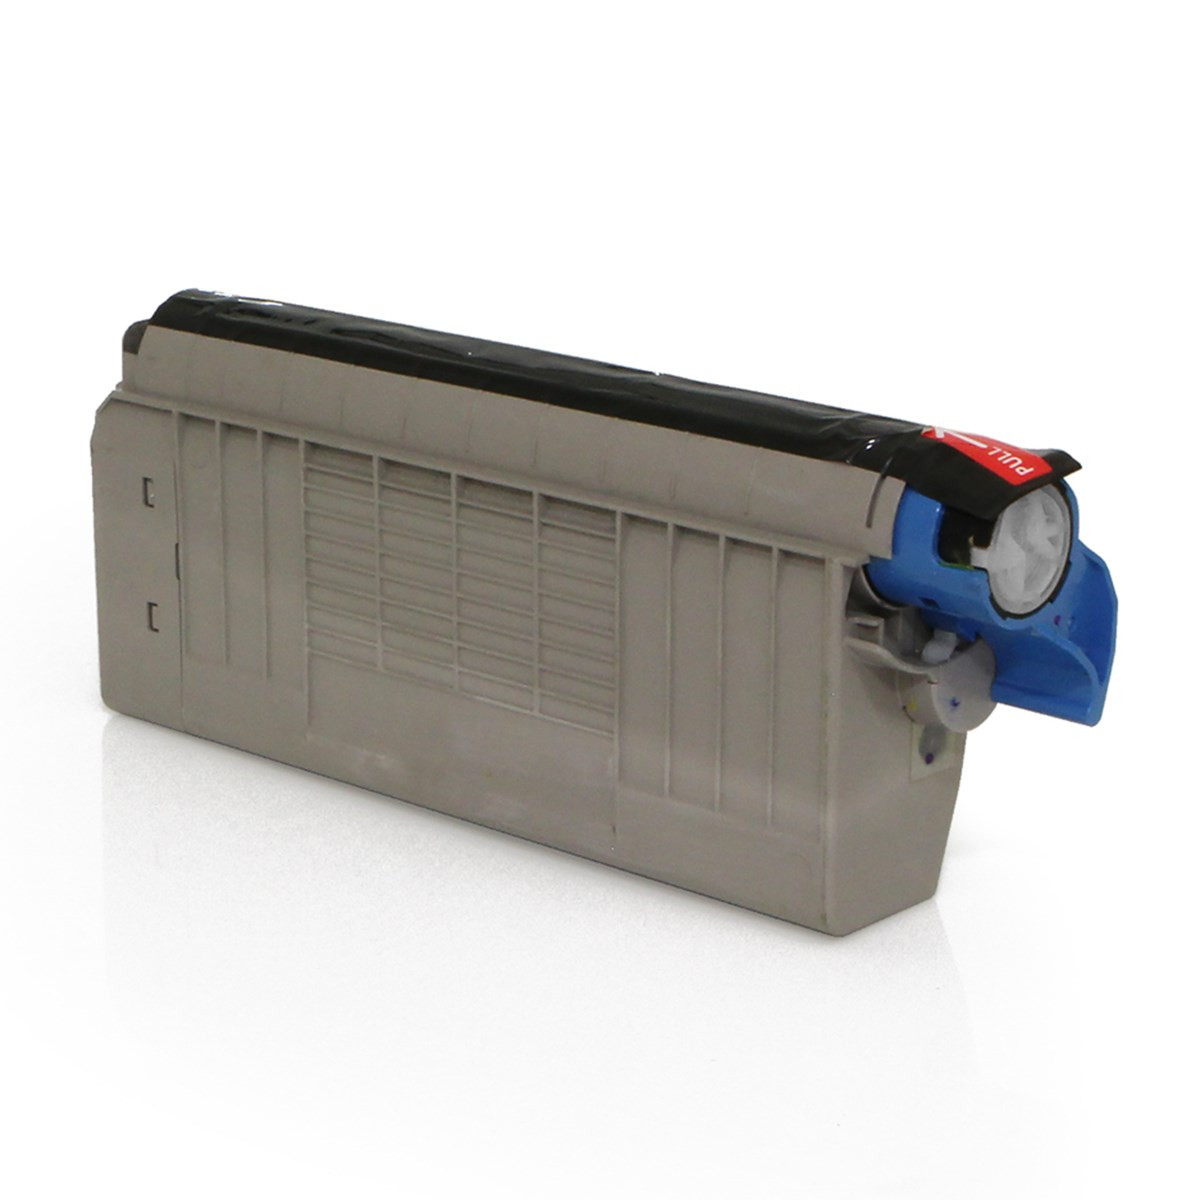 Toner Compatível com Okidata C711 C711N C711WT C710 C710DN Amarelo 44318601   Importado 11.5k